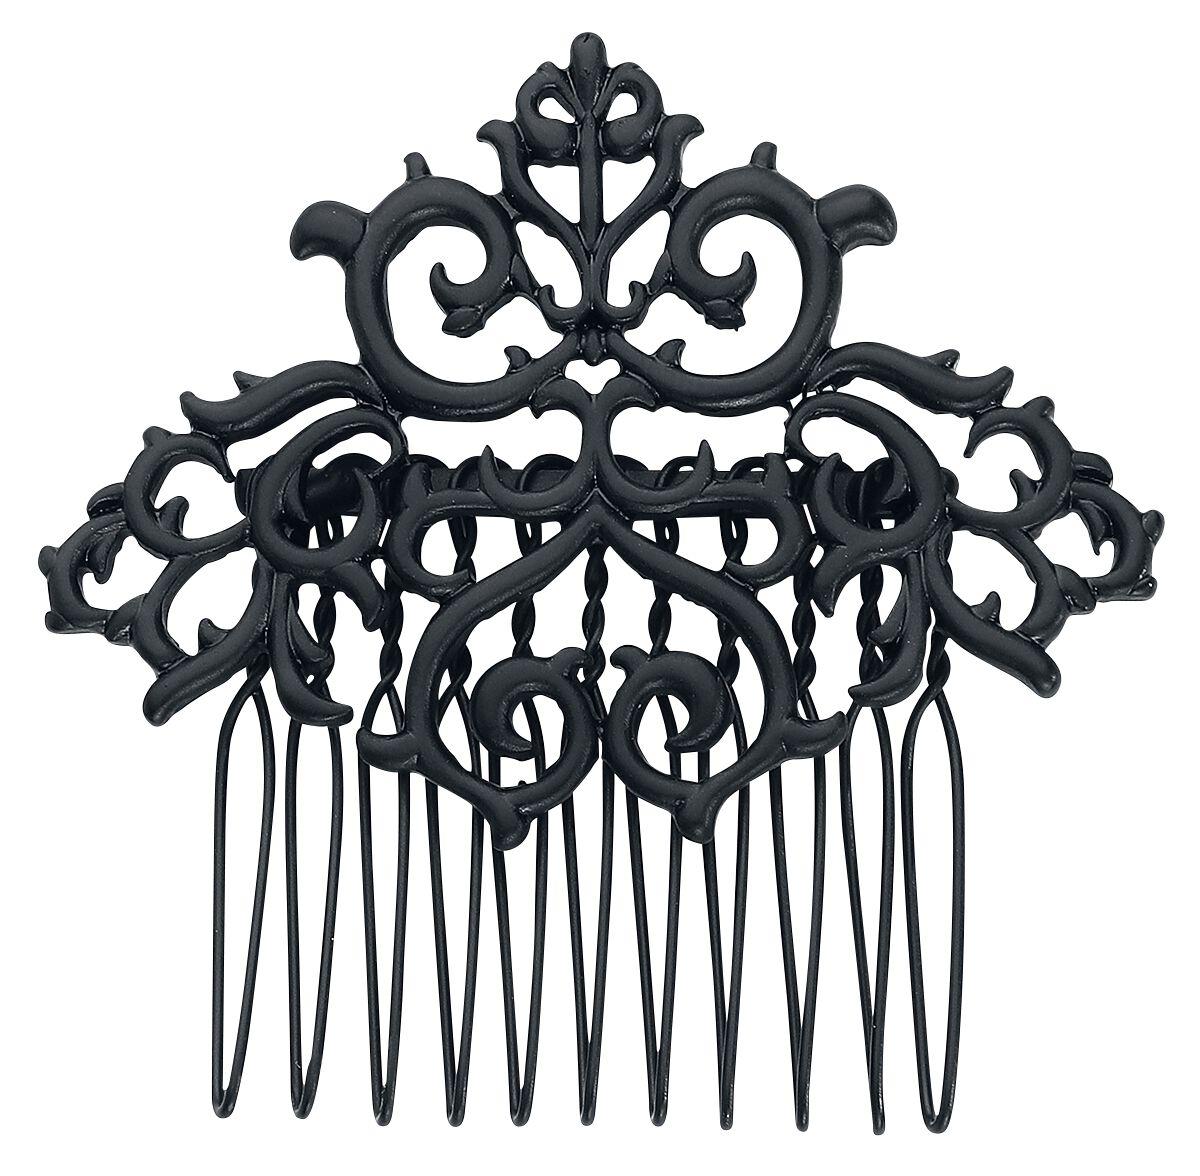 Image of   Blackheart Black Filigree hårbørste Hårspænde sort